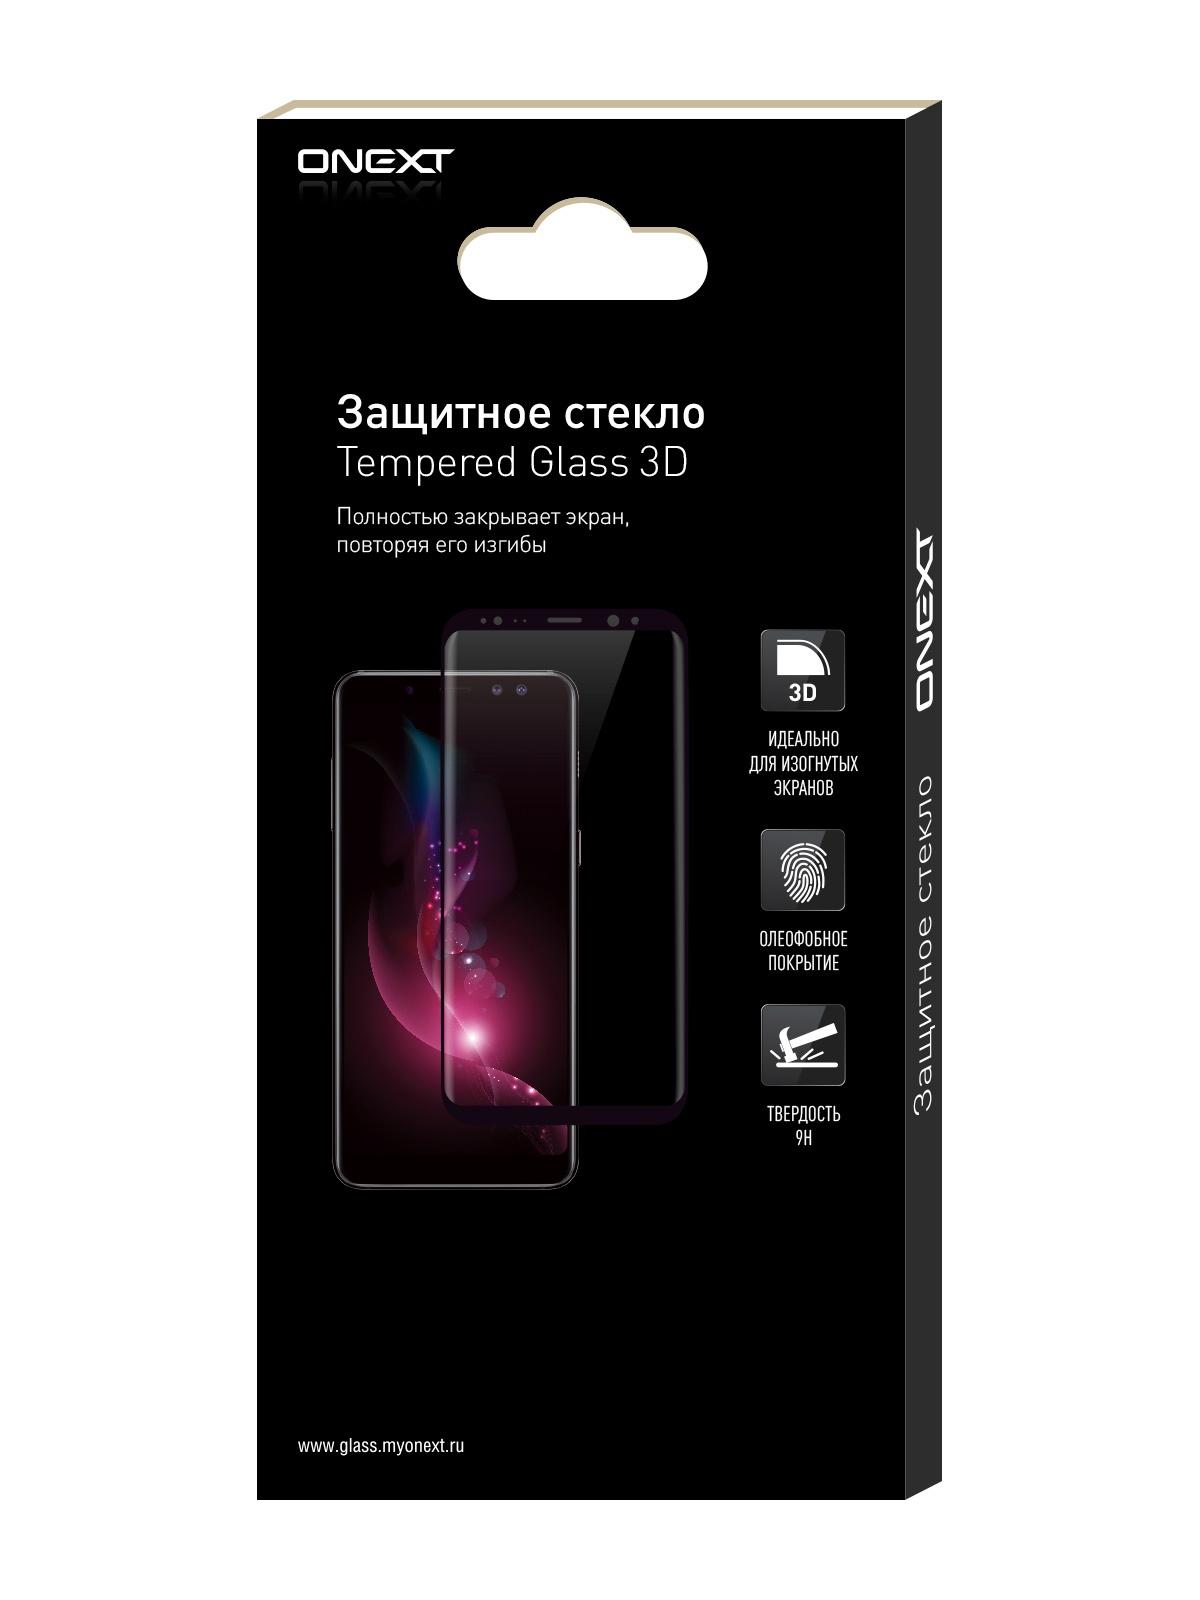 Защитное стекло ONEXT Huawei Mate 10 Pro 3D